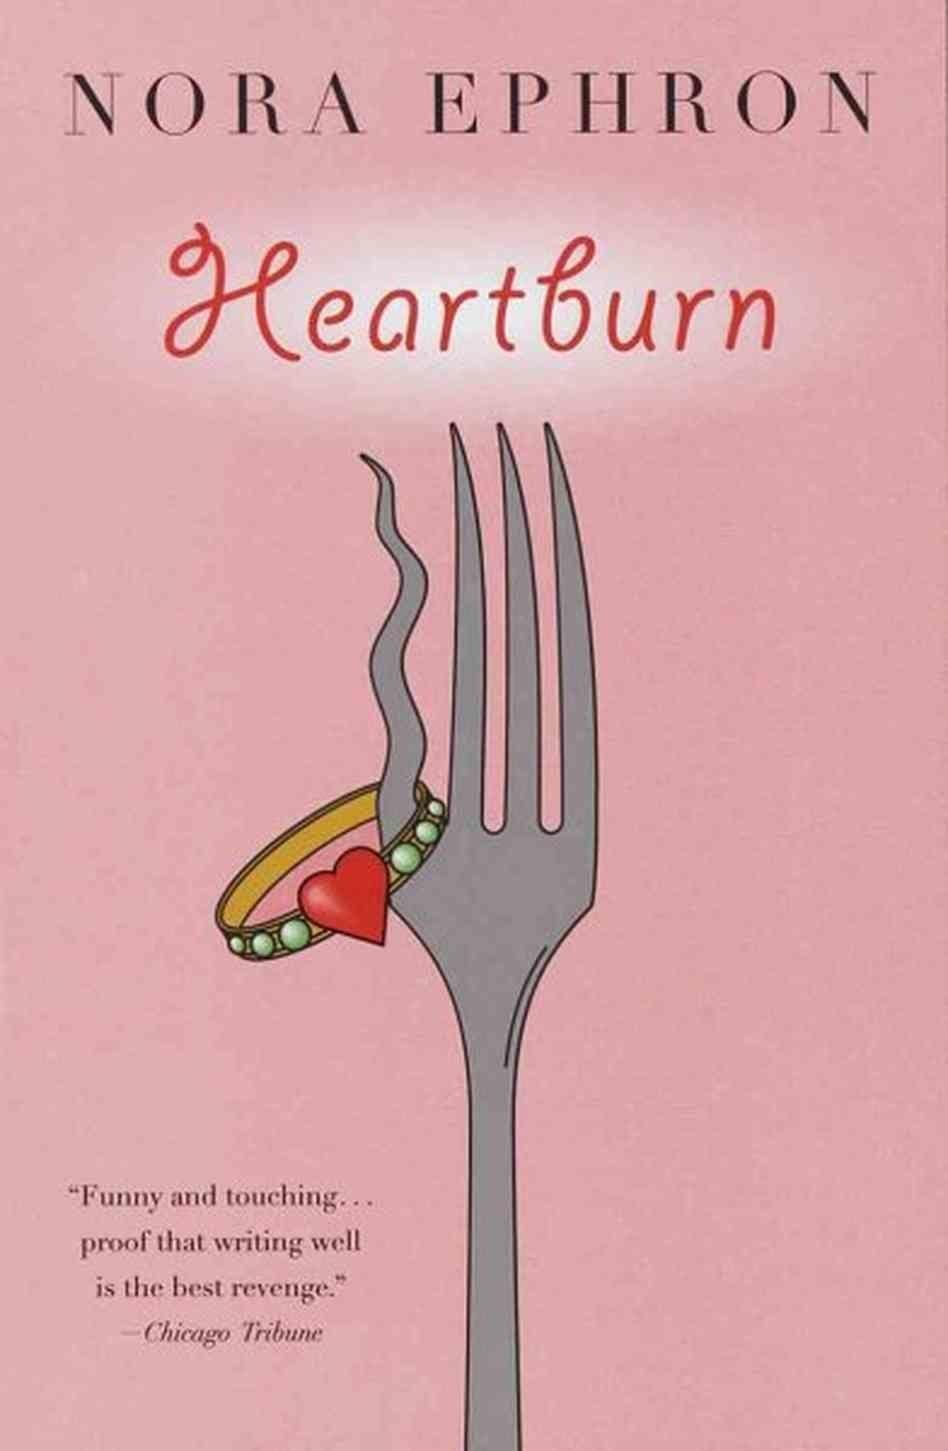 """<a href=""http://www.randomhouse.com/book/46734/heartburn-by-nora-ephron"" target=""_blank""><em>Heartburn</em> by Nora Ephron</"